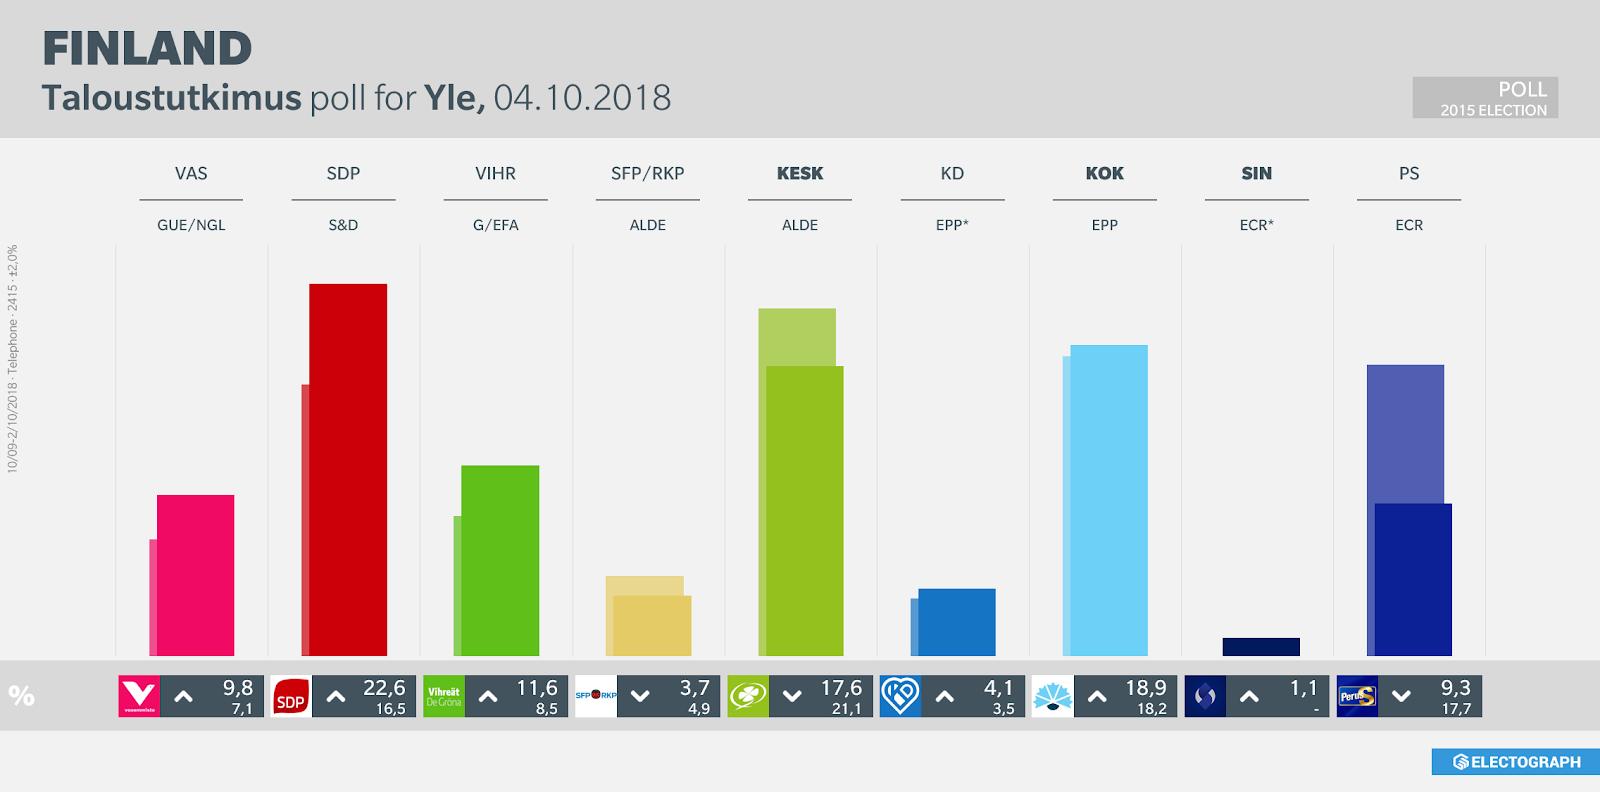 FINLAND: Taloustutkimus poll chart for Yle, October 2018